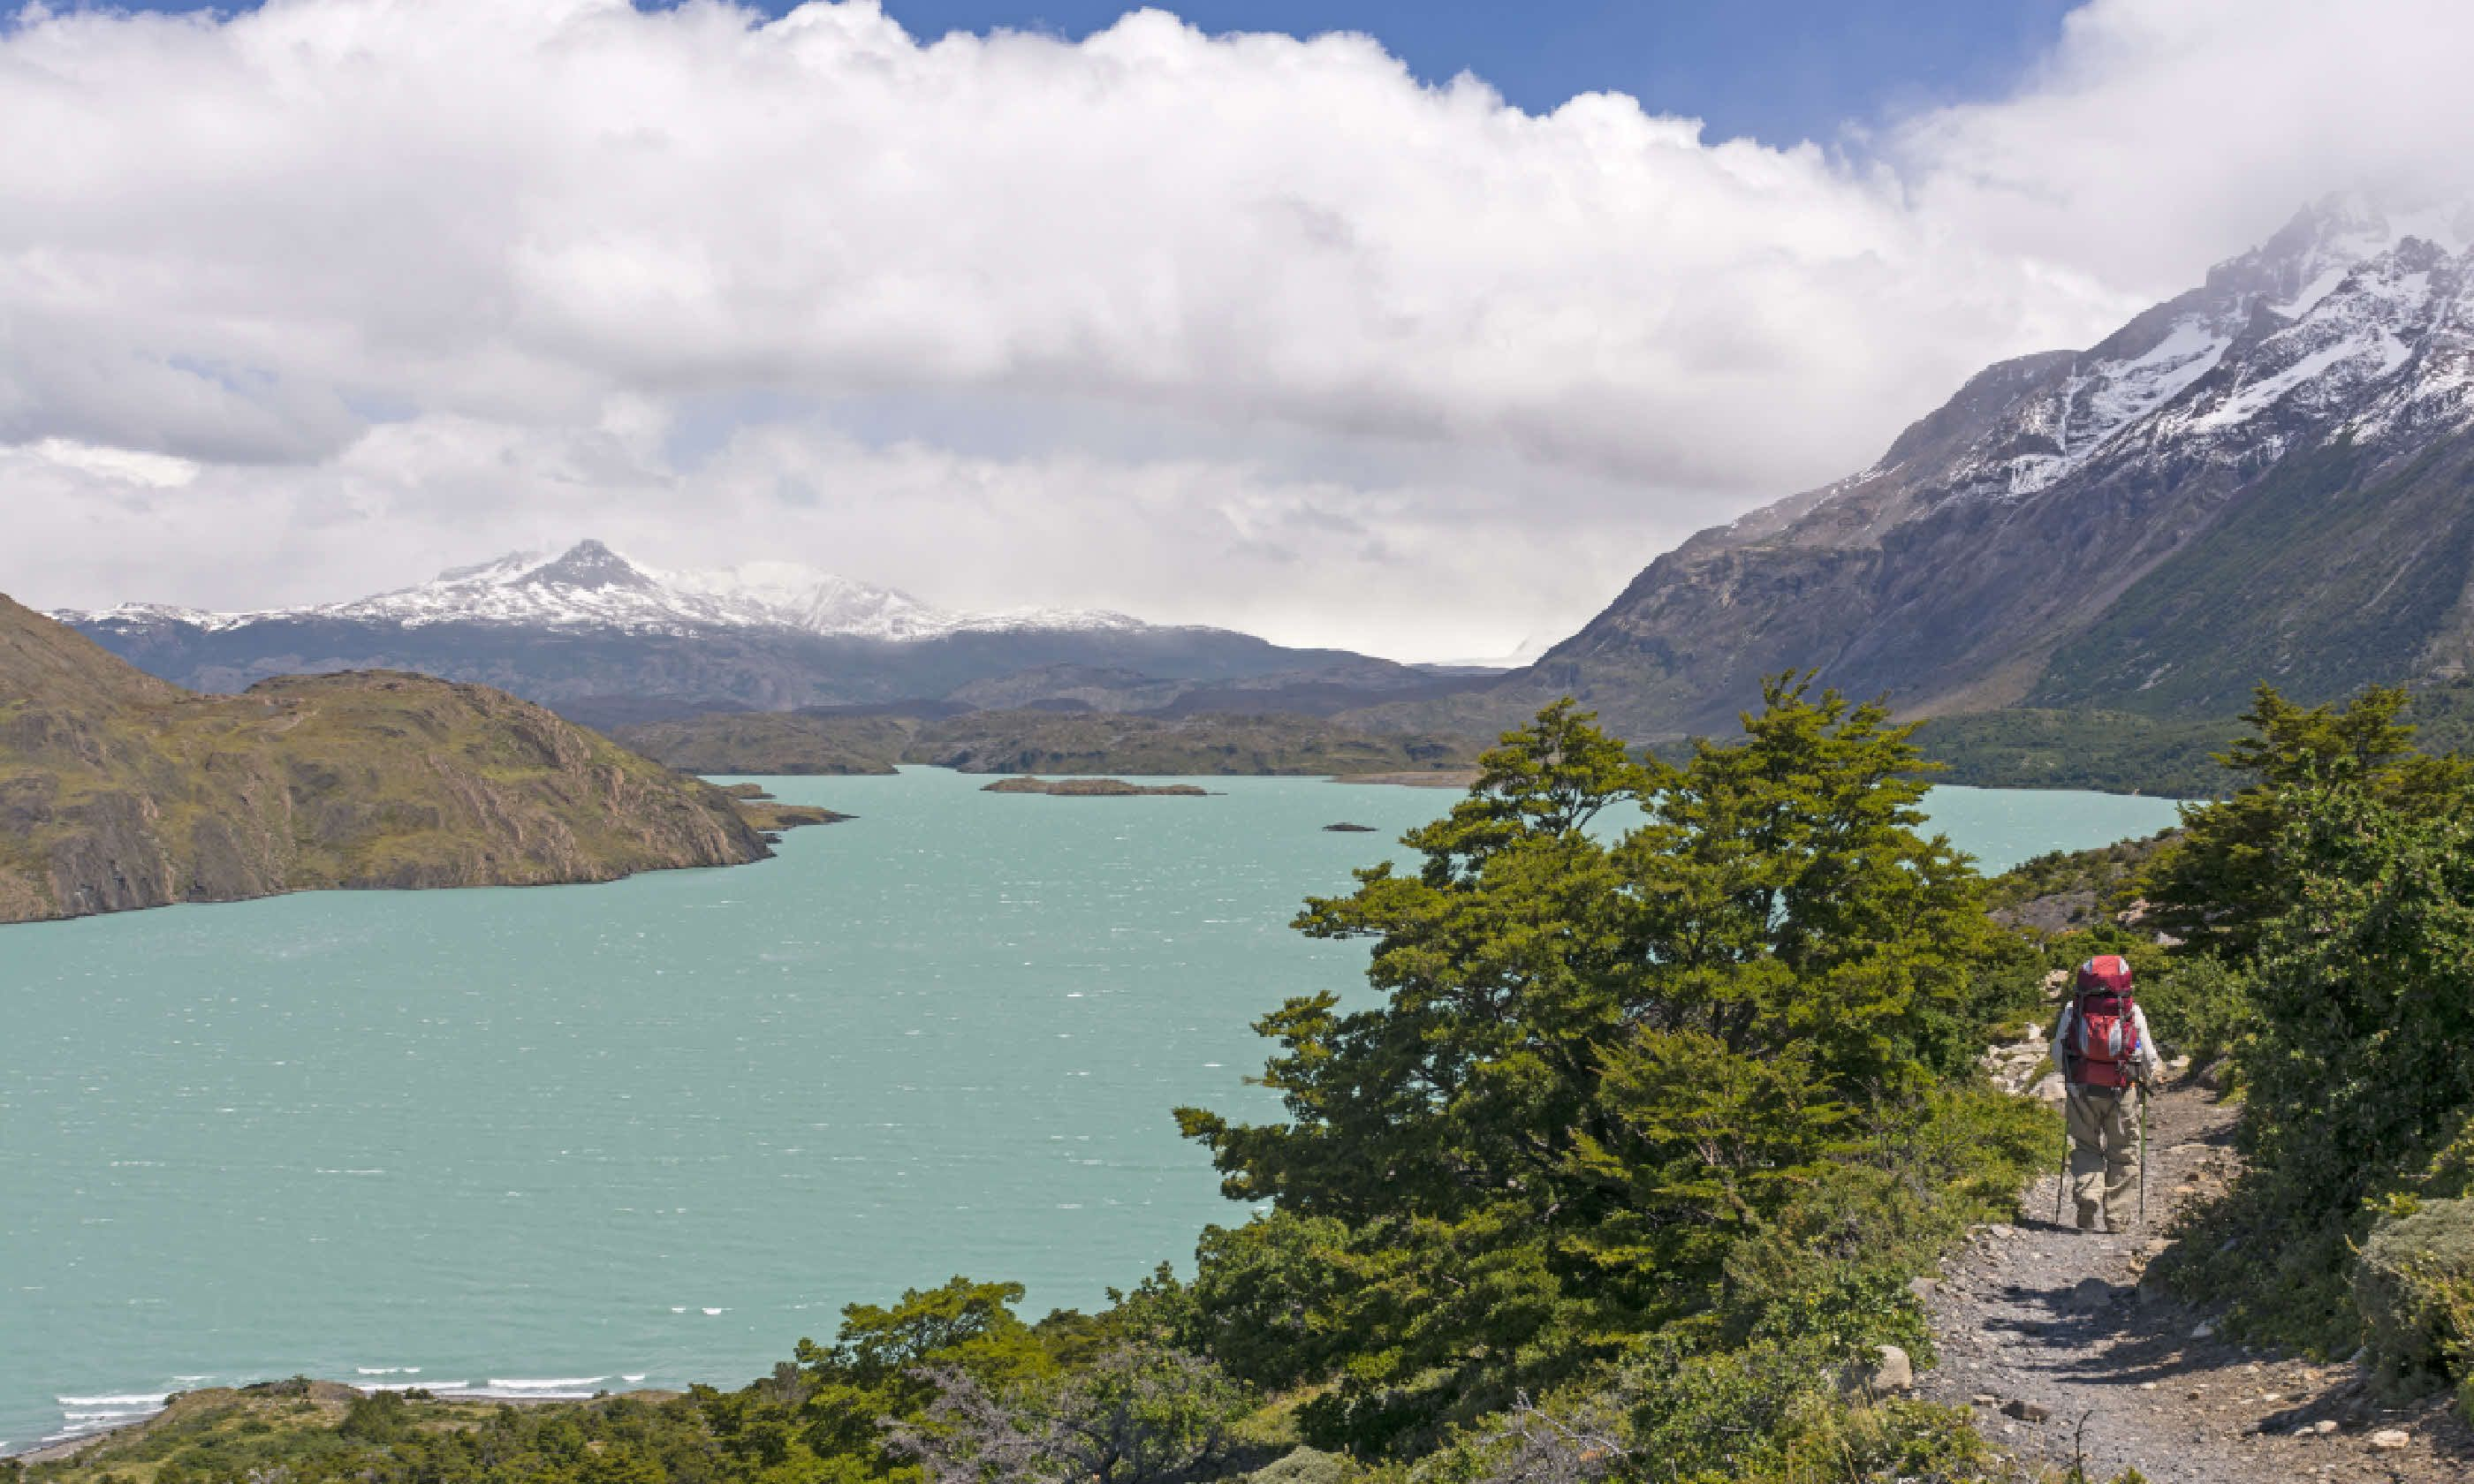 Lake Nordernskjold in Torres del Paine National Park (Shutterstock)